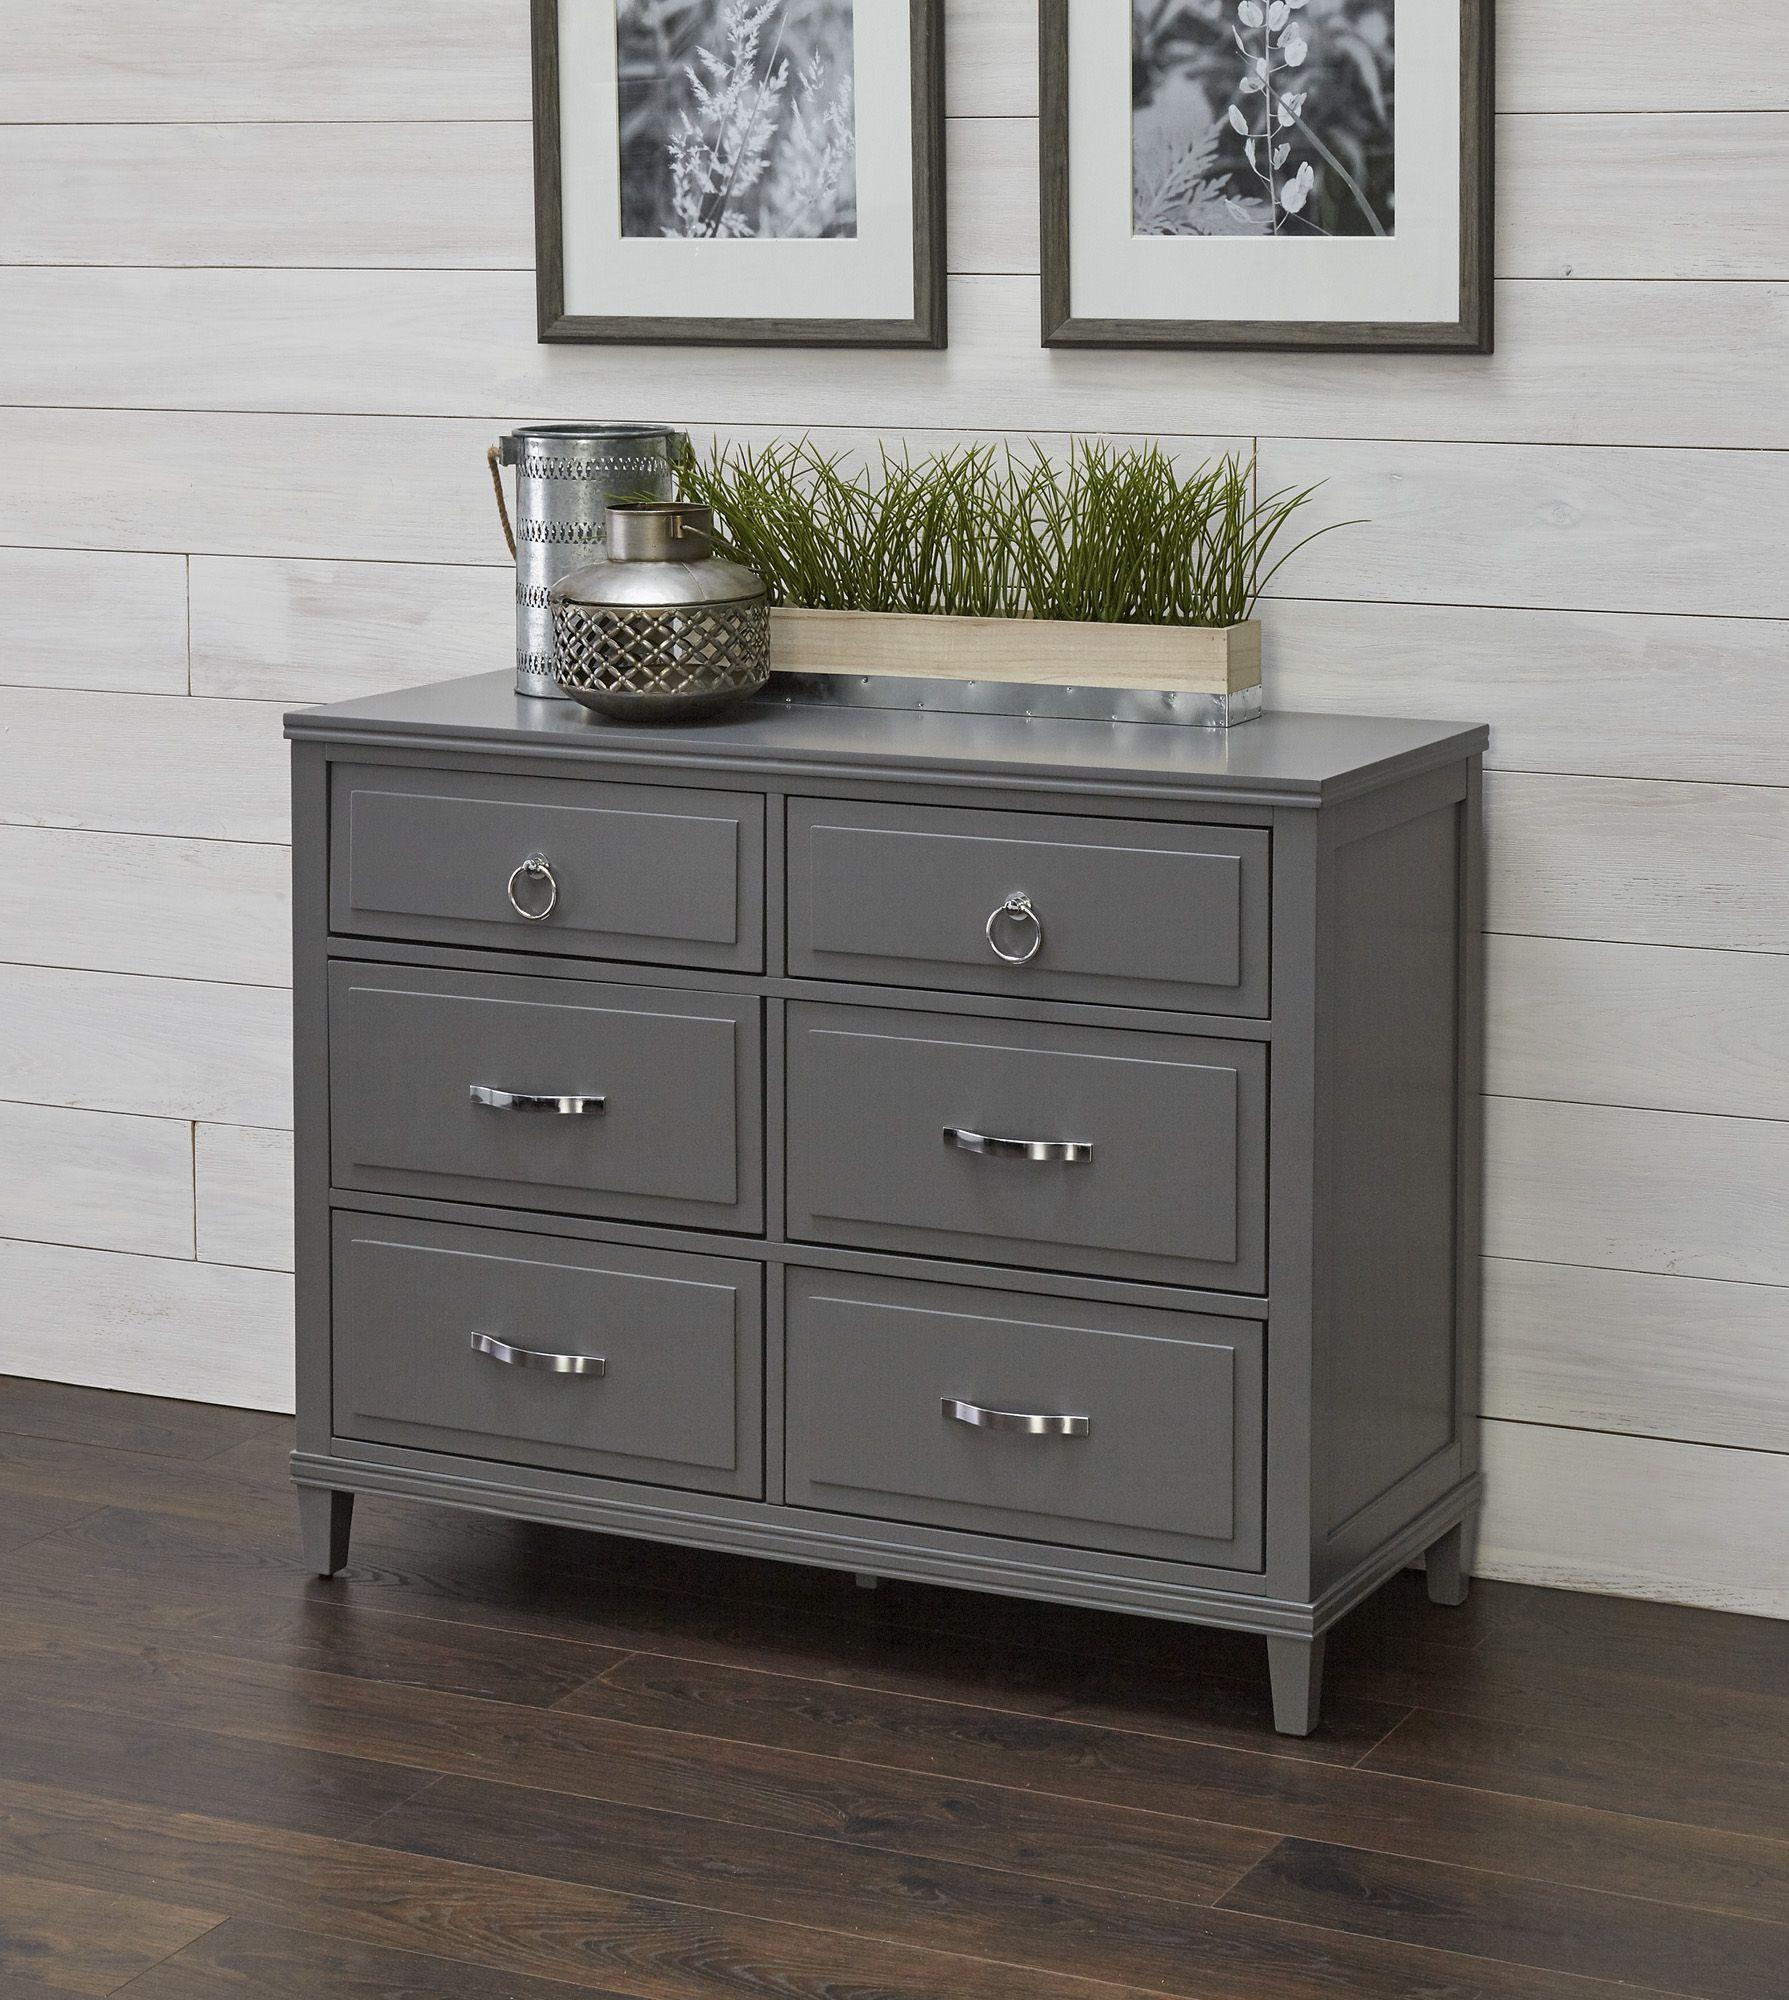 Fingerhut Mcleland Design Tate 6 Drawer Dresser